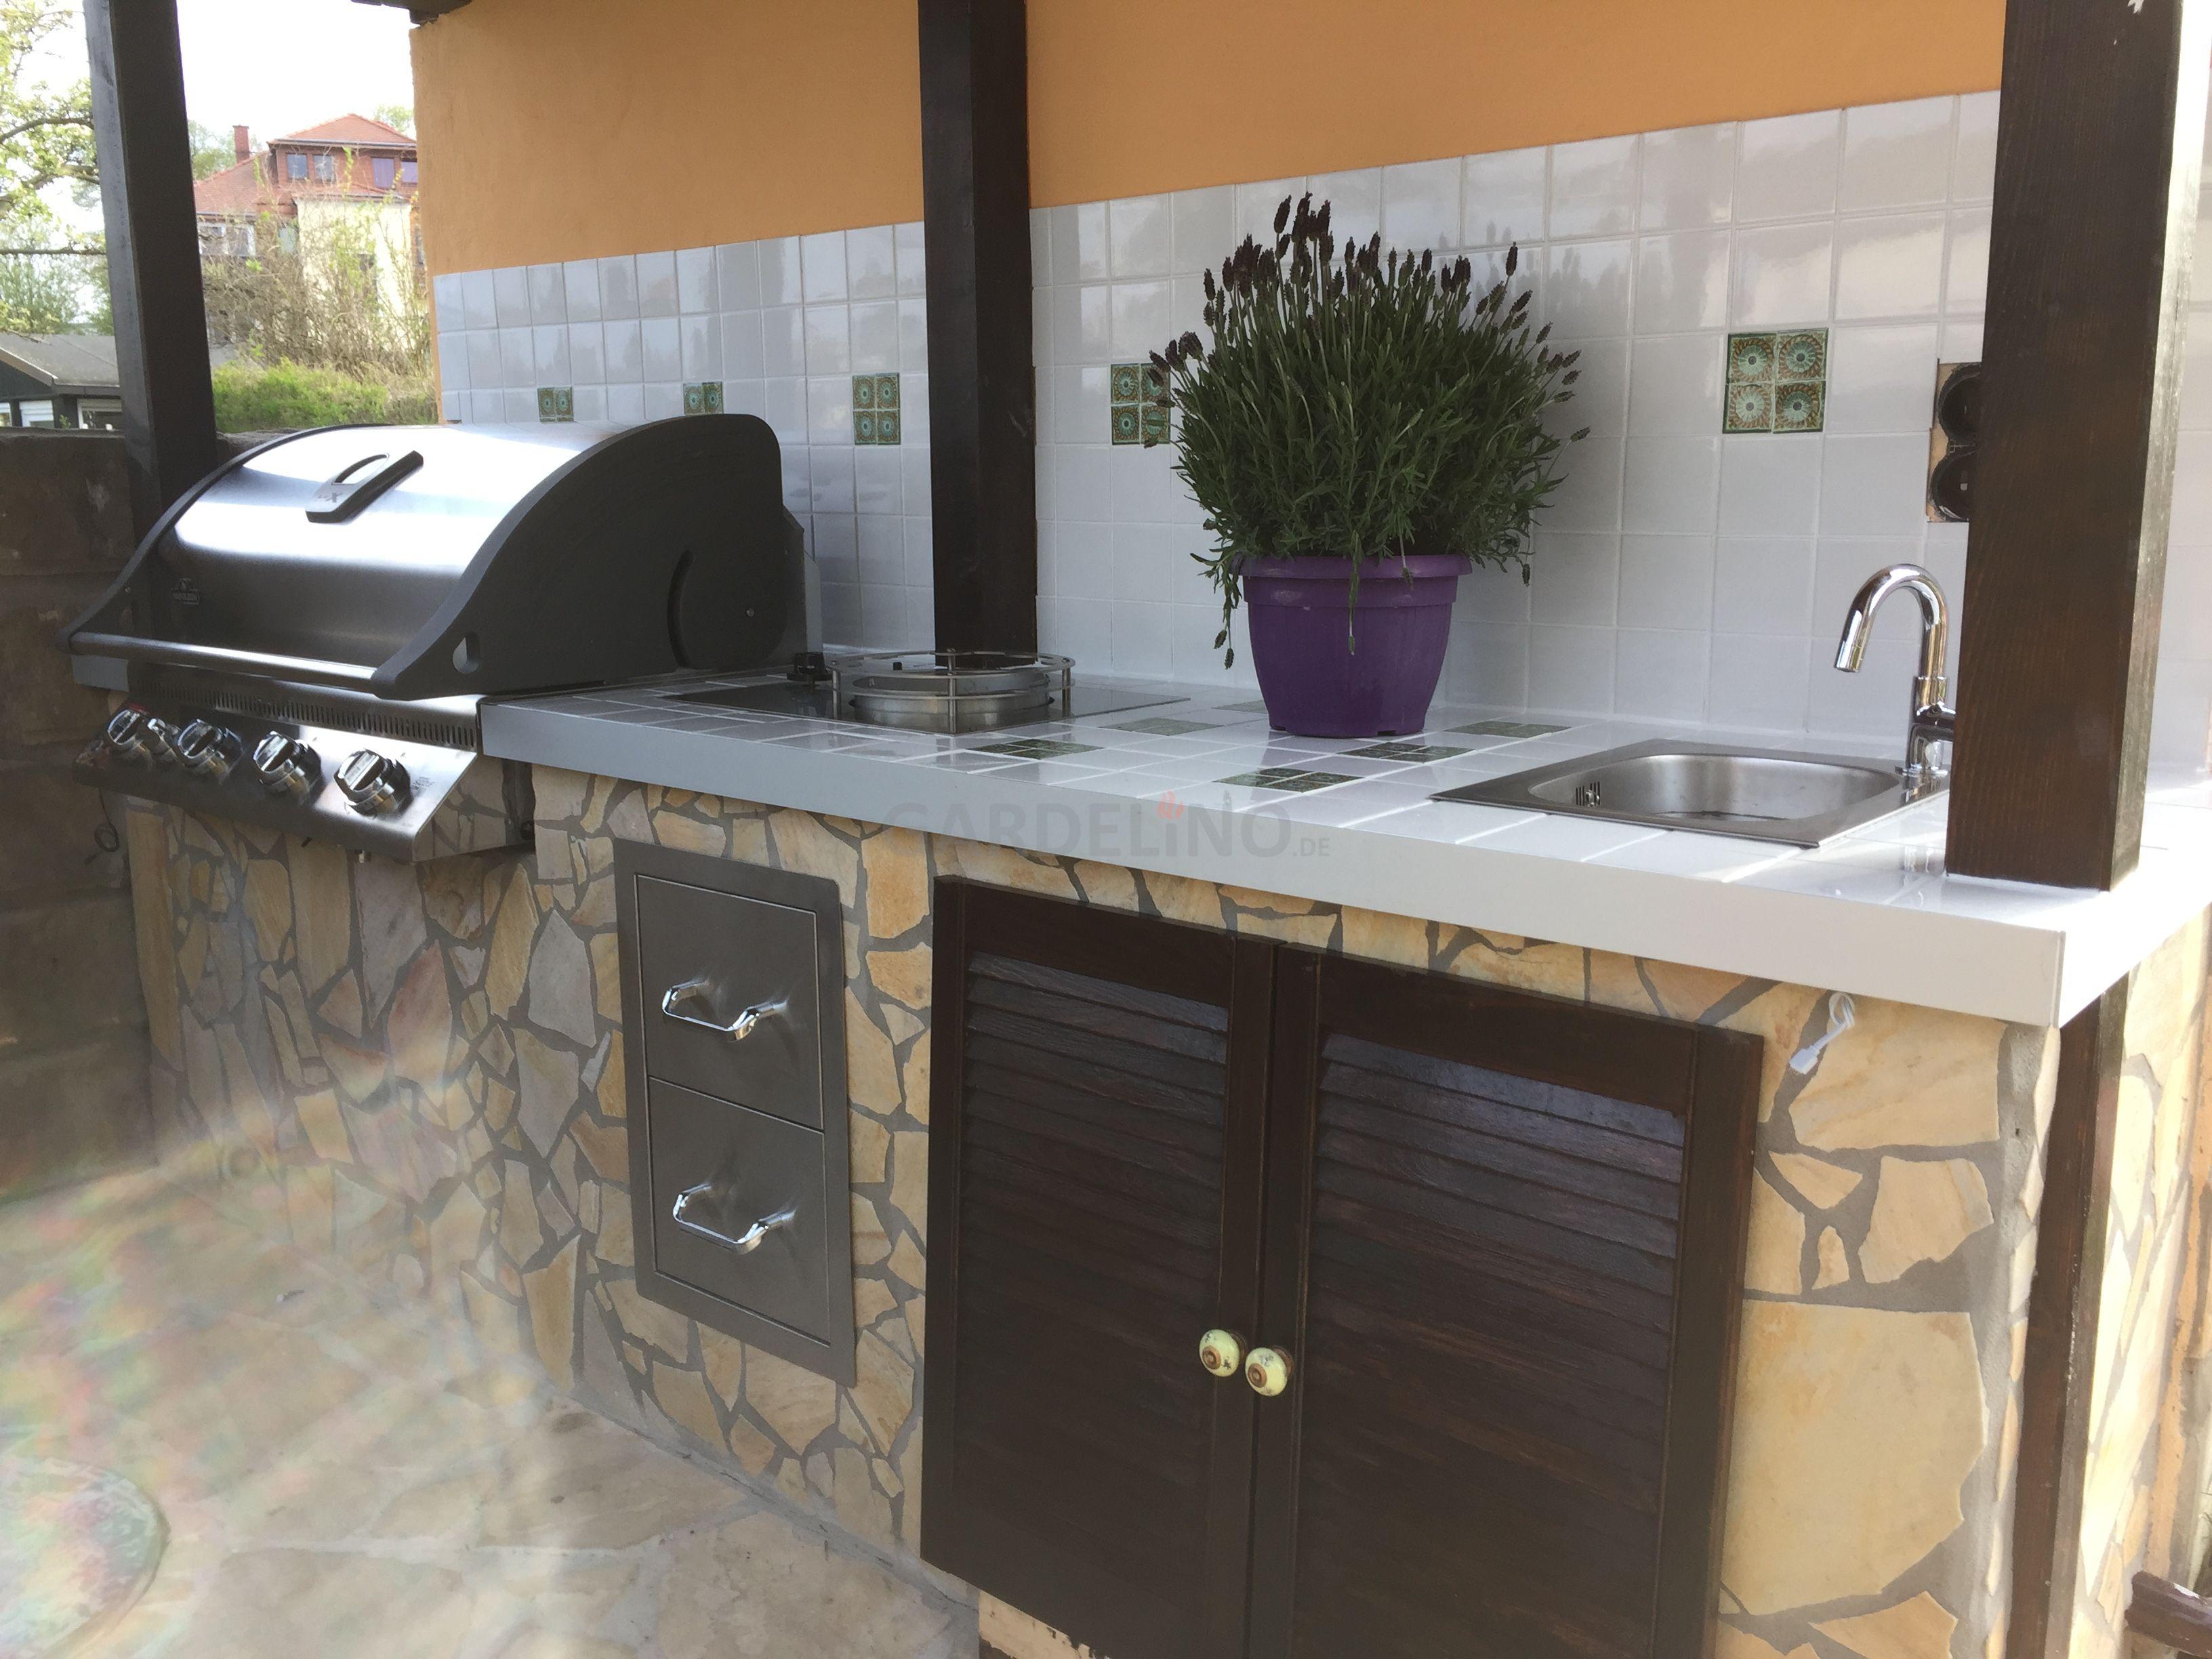 Outdoorküche Napoleon Bbq : Idee: selbstgebaute outdoorküche mit napoleon gasgrill und wok